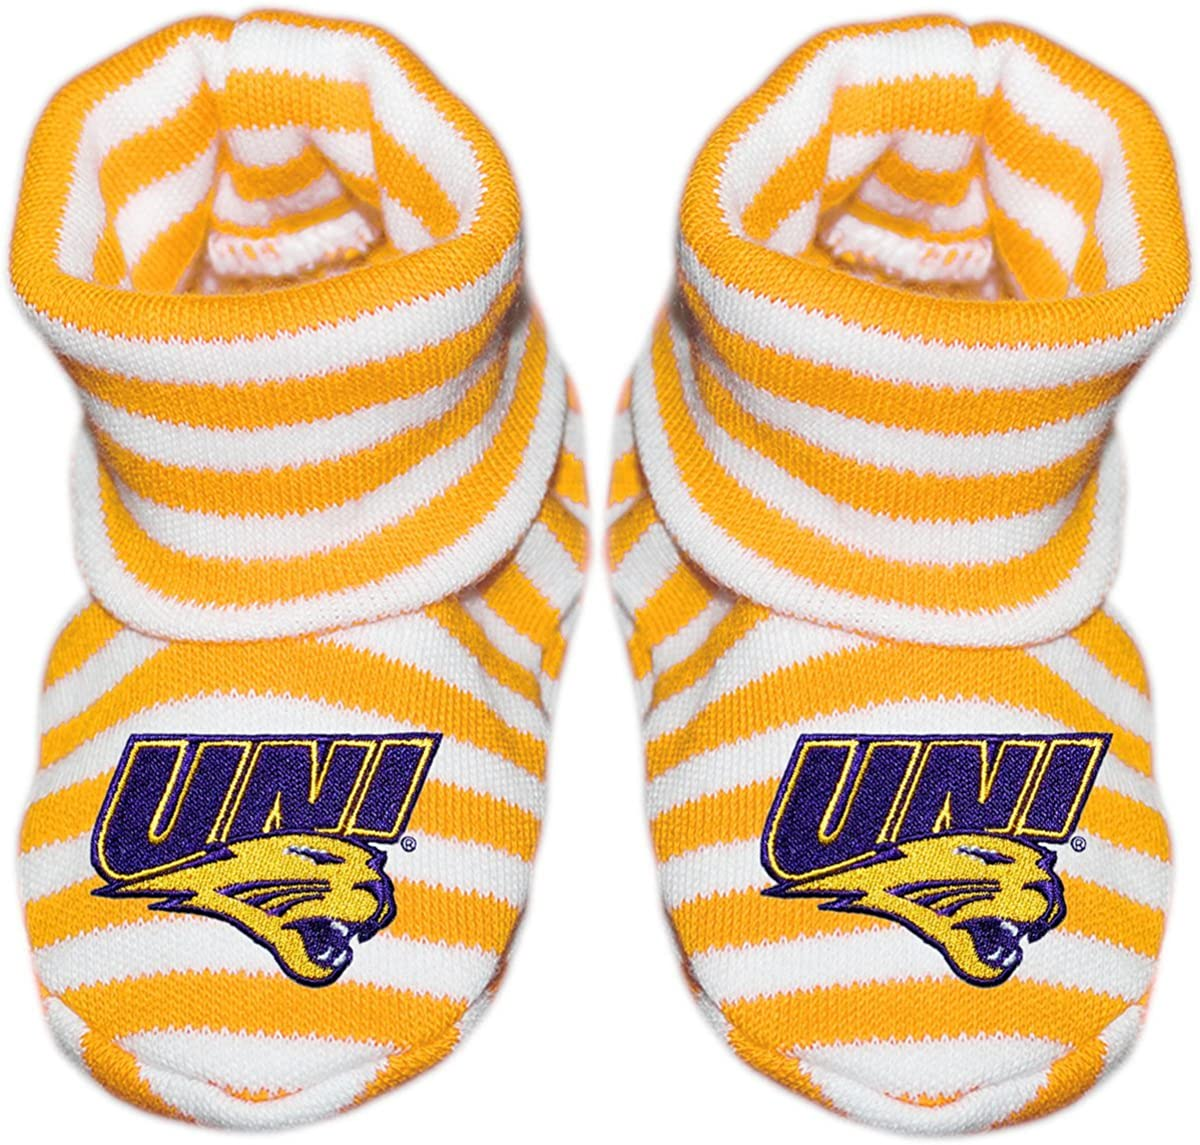 University of Northern Iowa UNI Bootie quality assurance Baby Striped Sock Fashion Newborn